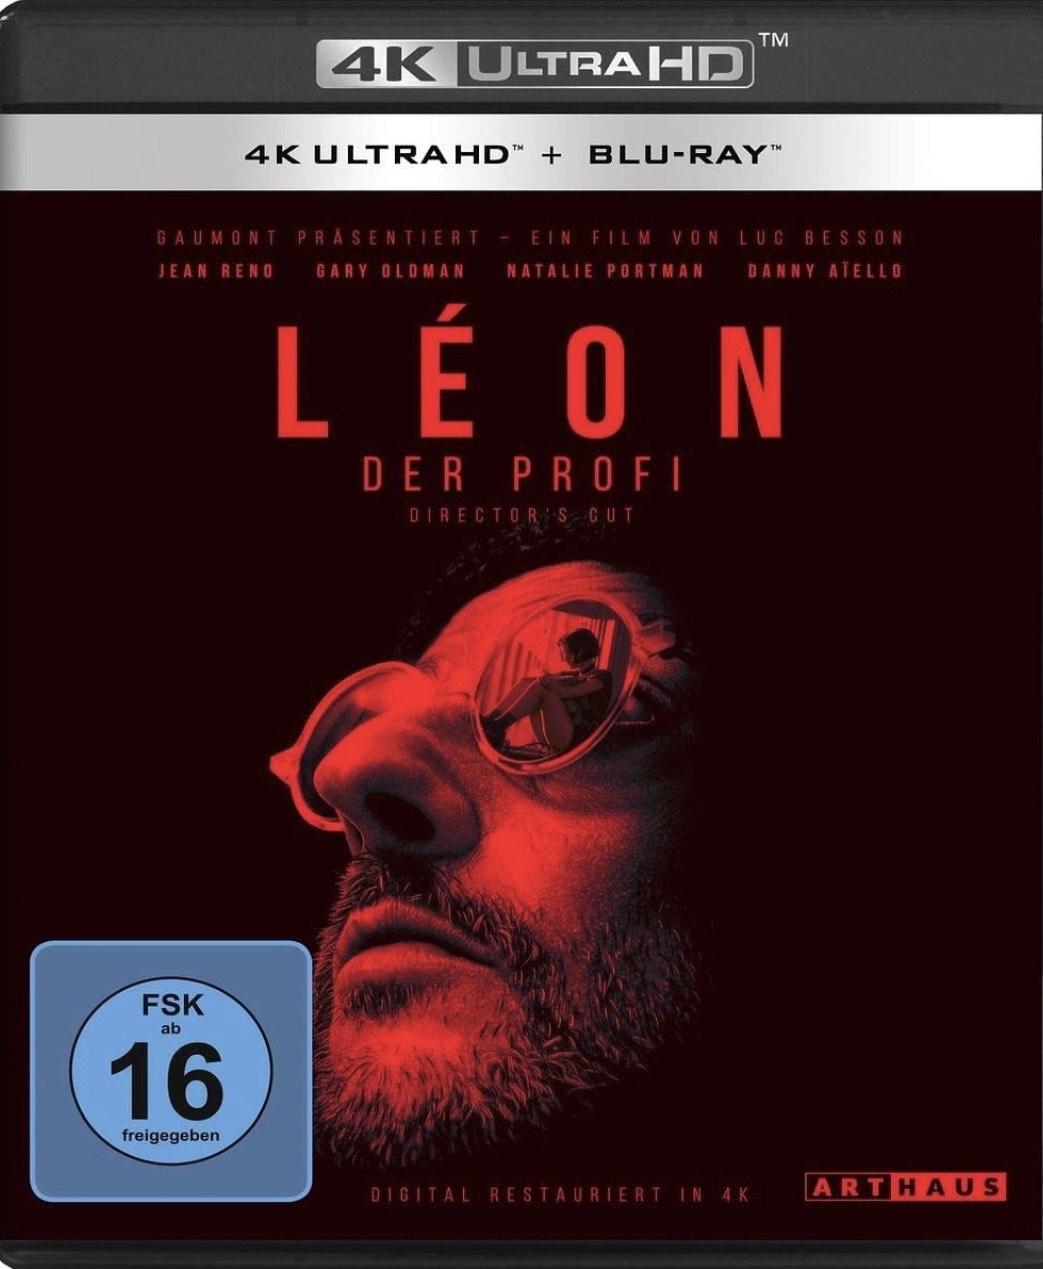 Leon - Der Profi (4K Blu-Ray), Amazon Prime